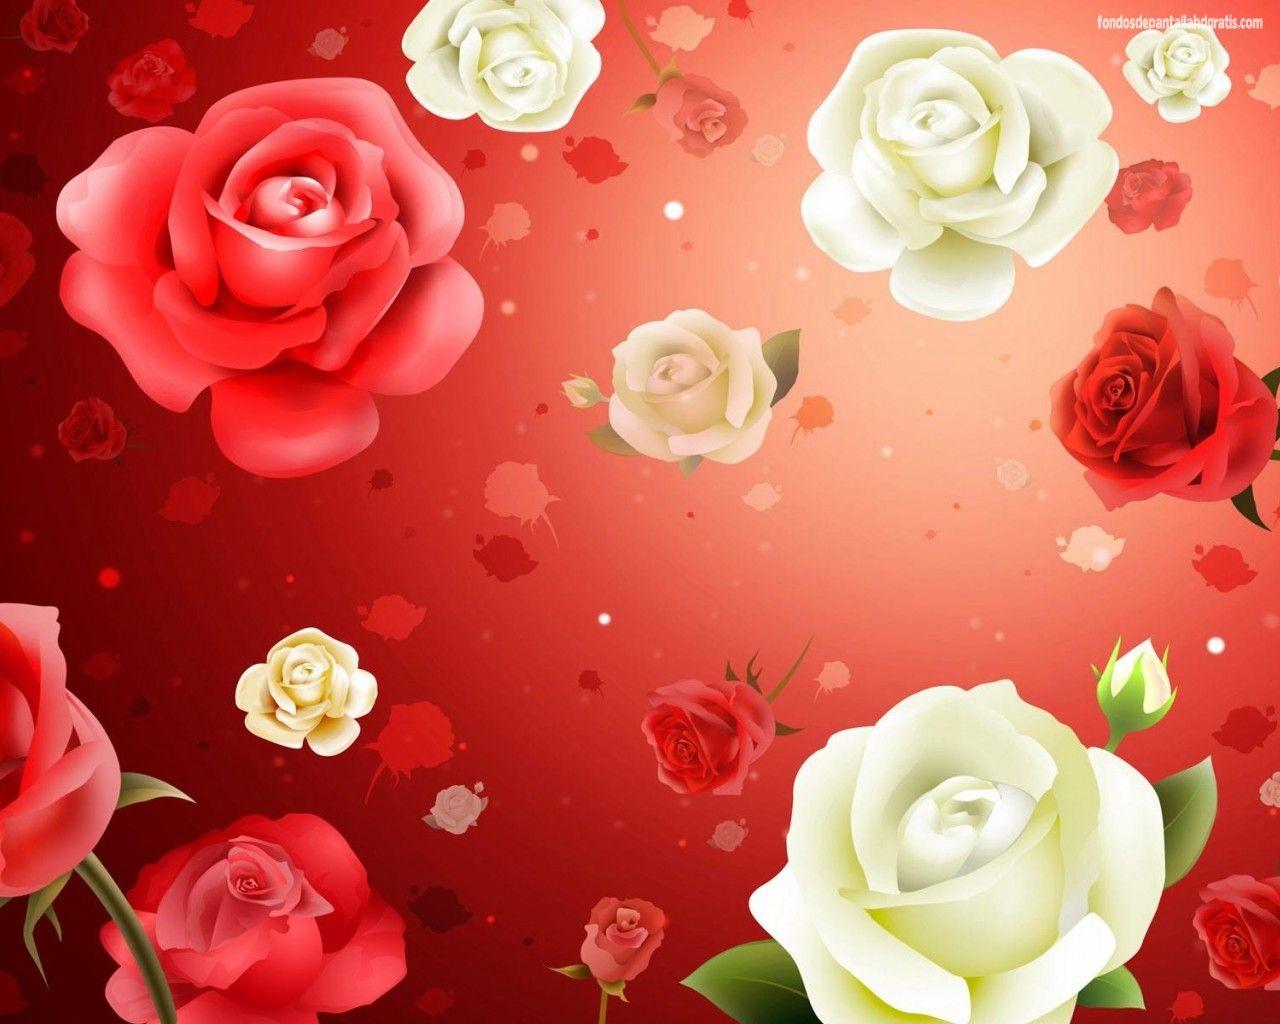 Fondos de flores gratis para protector de pantalla 12 hd for Protector de pantalla en movimiento